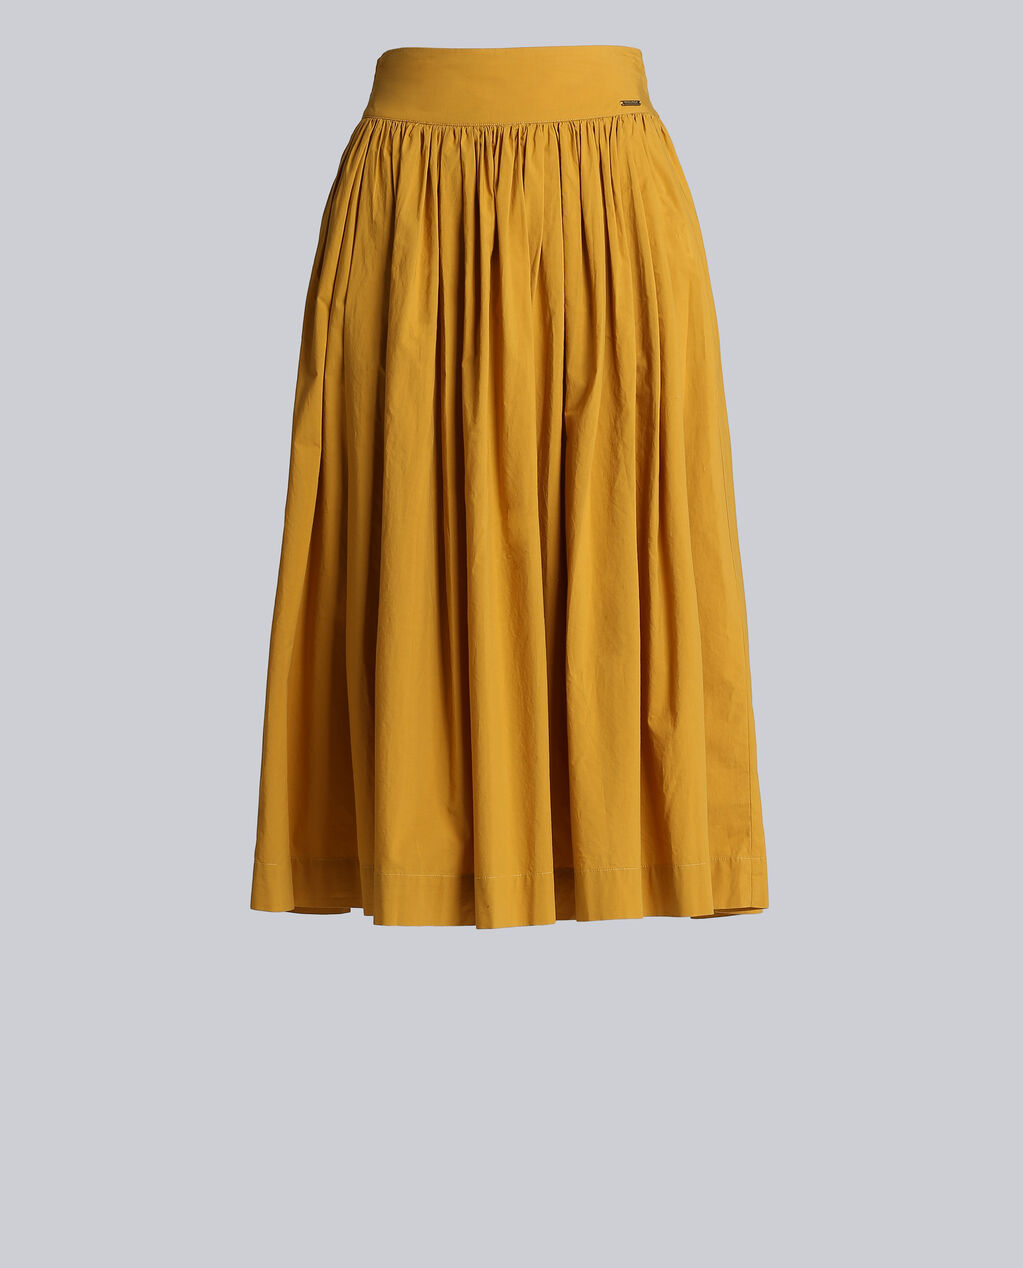 4b544b9f144 WO GONNE - SKIRTS Yellow Tierra WWGON0332-PO90